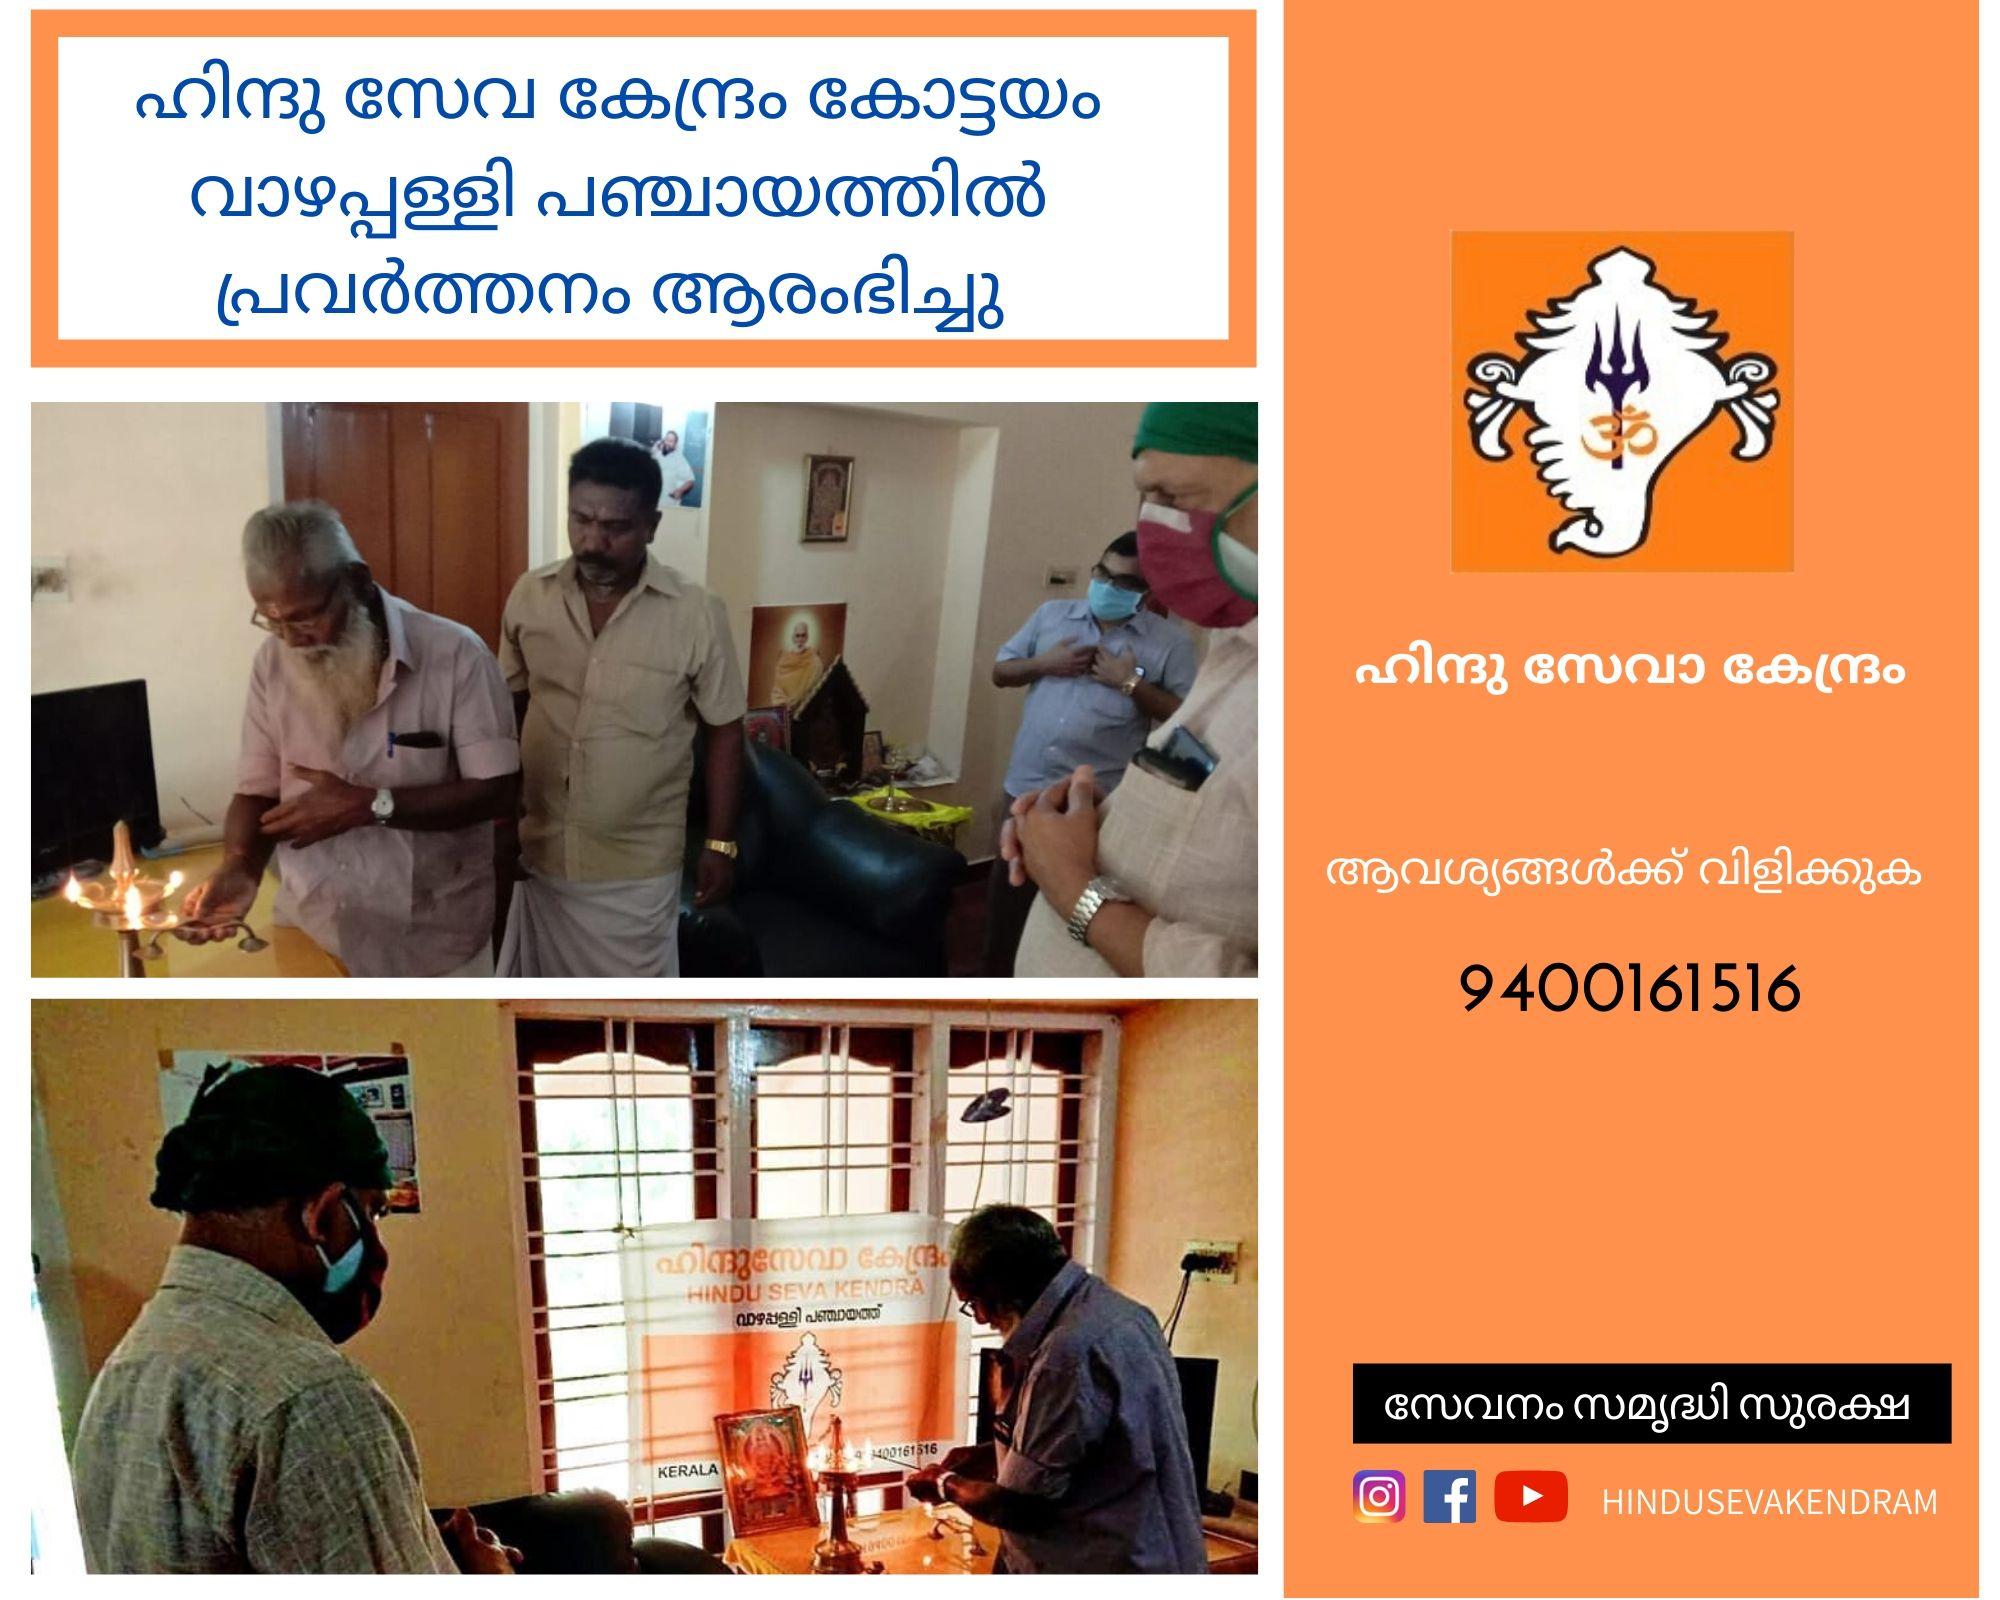 Hindu Seva Kendram opens new center at Vazhappally panchayath in Kottayam